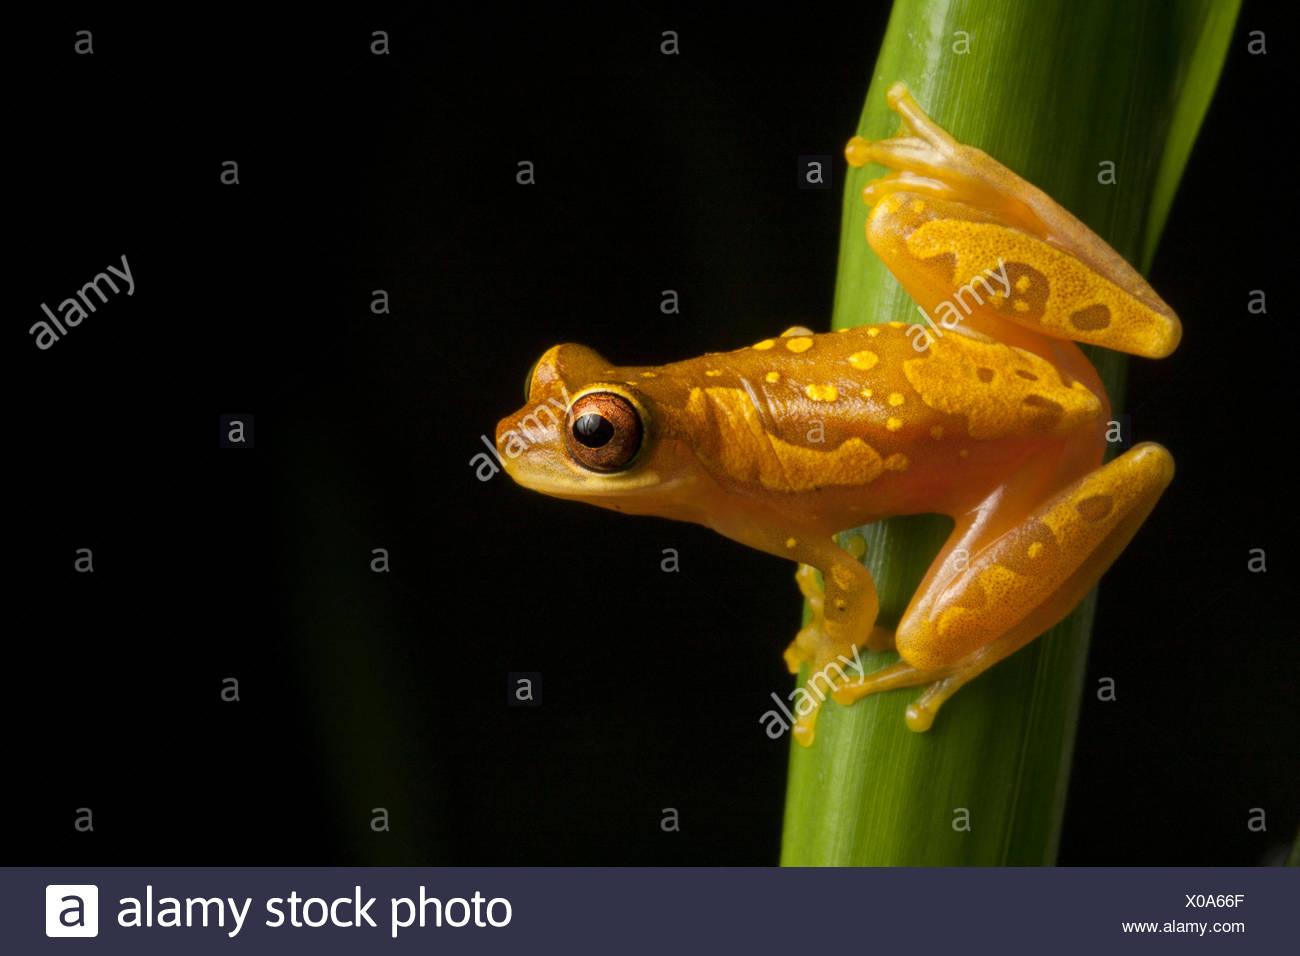 Portrait of a hourglass tree frog, Dendropsophus ebraccatus. - Stock Image